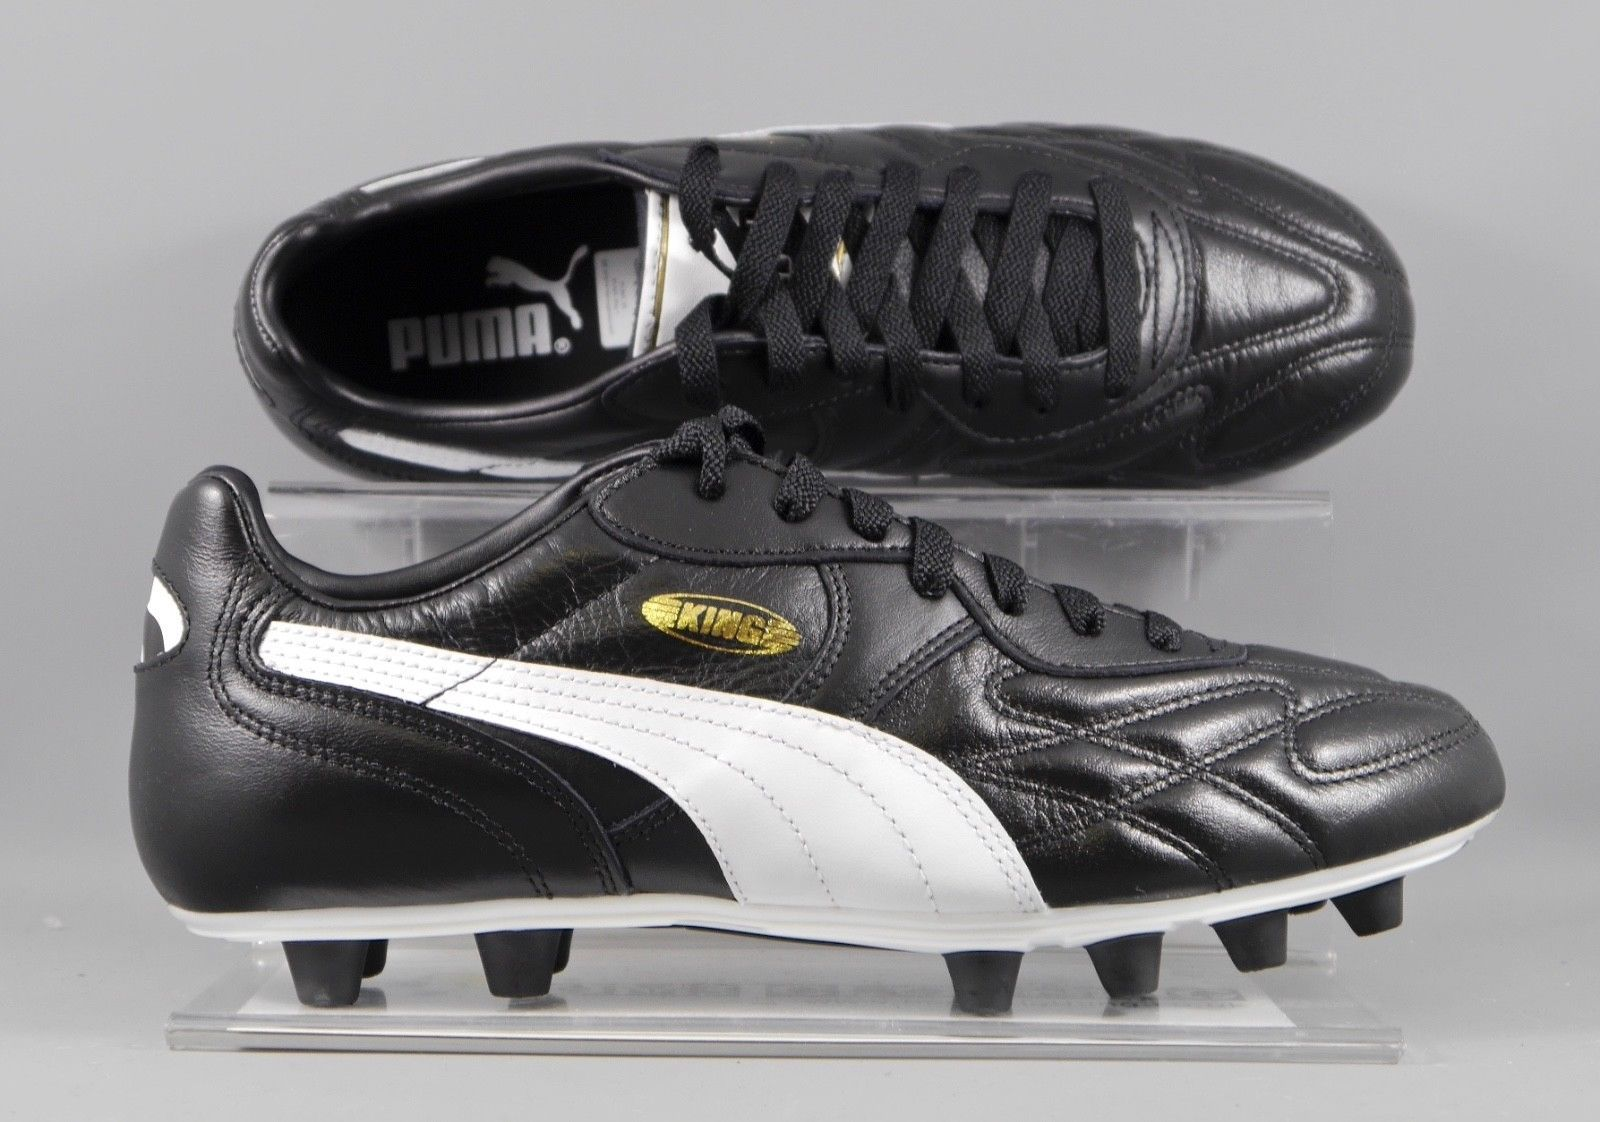 102463 01 Puma King Top K DI FG firm ground football boot